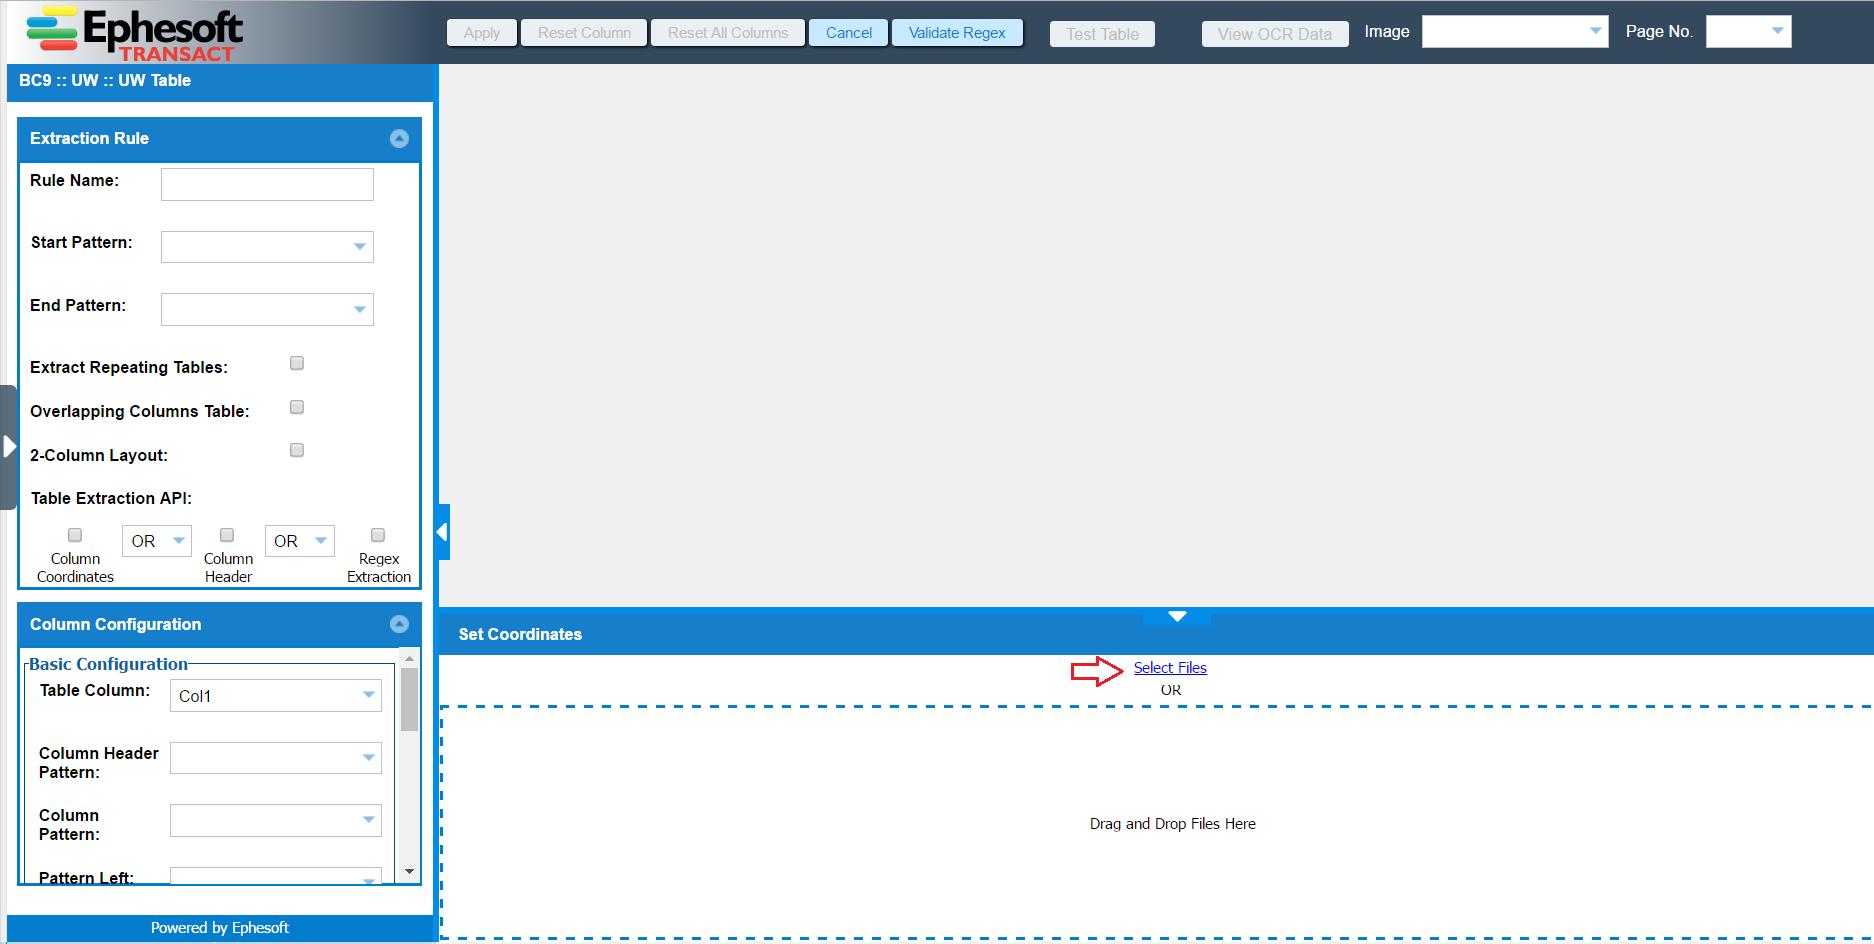 C:UsersEphesoftAppDataLocalMicrosoftWindowsINetCacheContent.Wordextr-rule.png